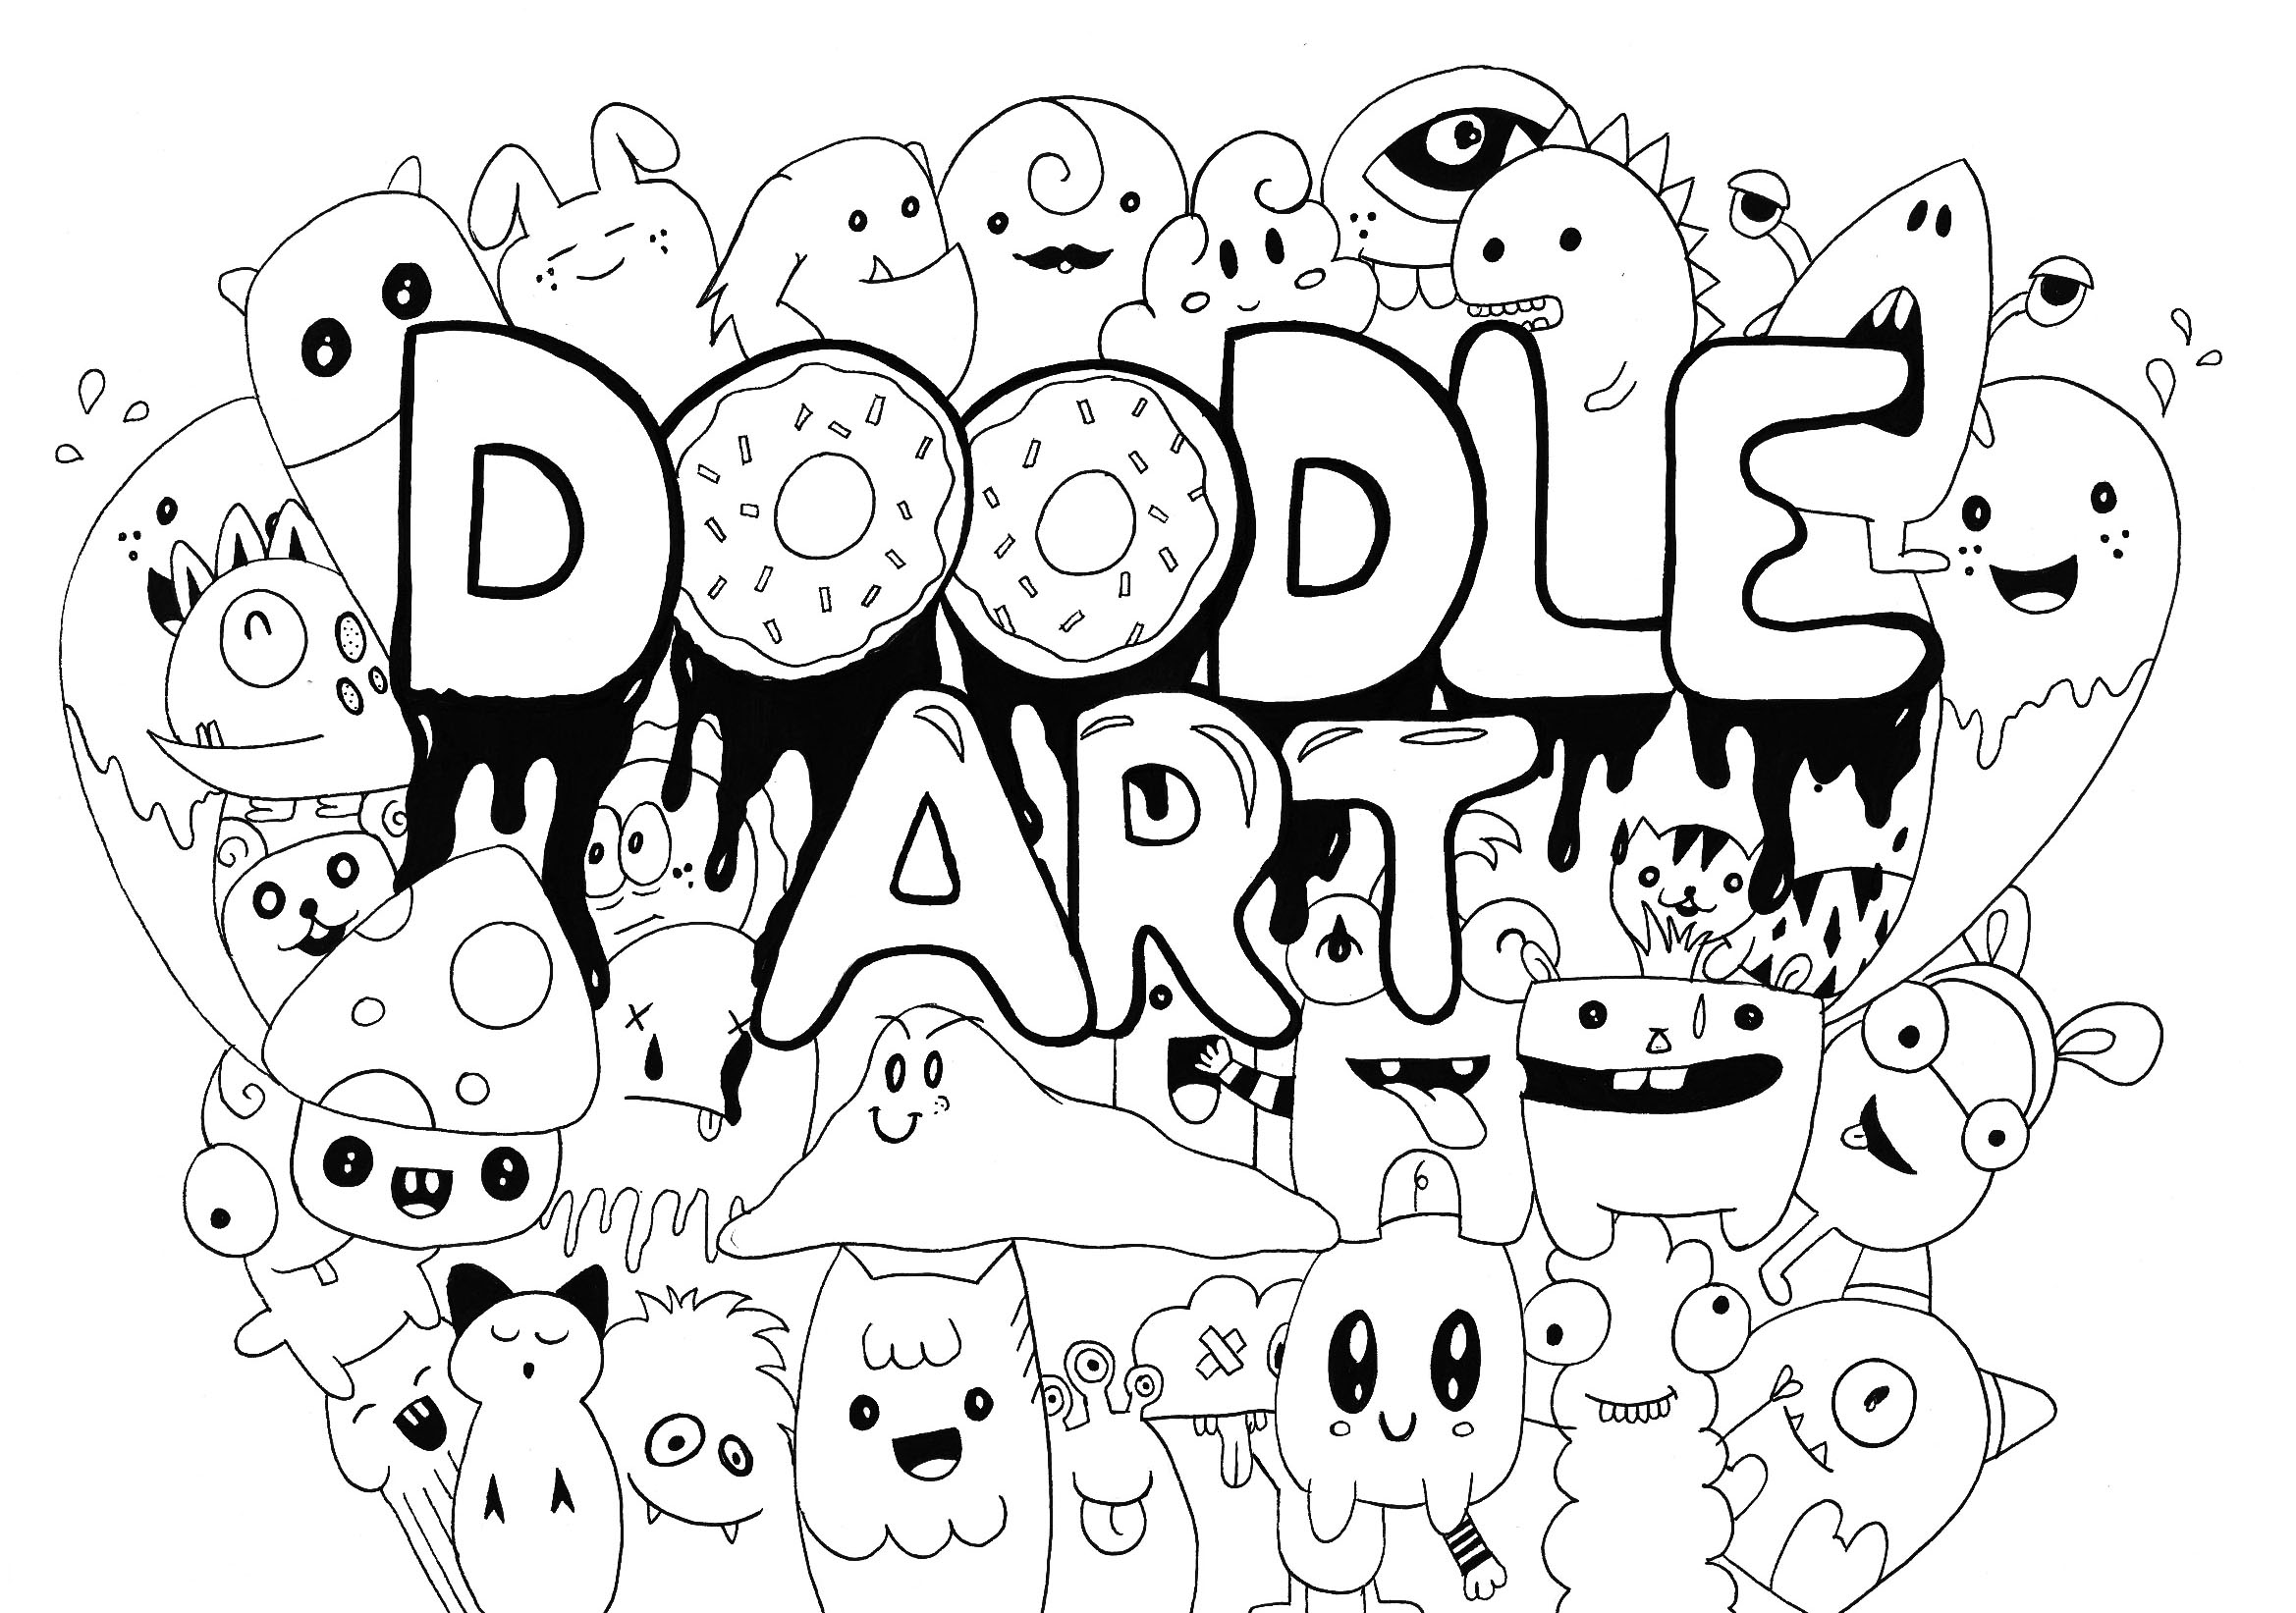 Disegni da colorare per adulti : Doodle art / Doodling - 36